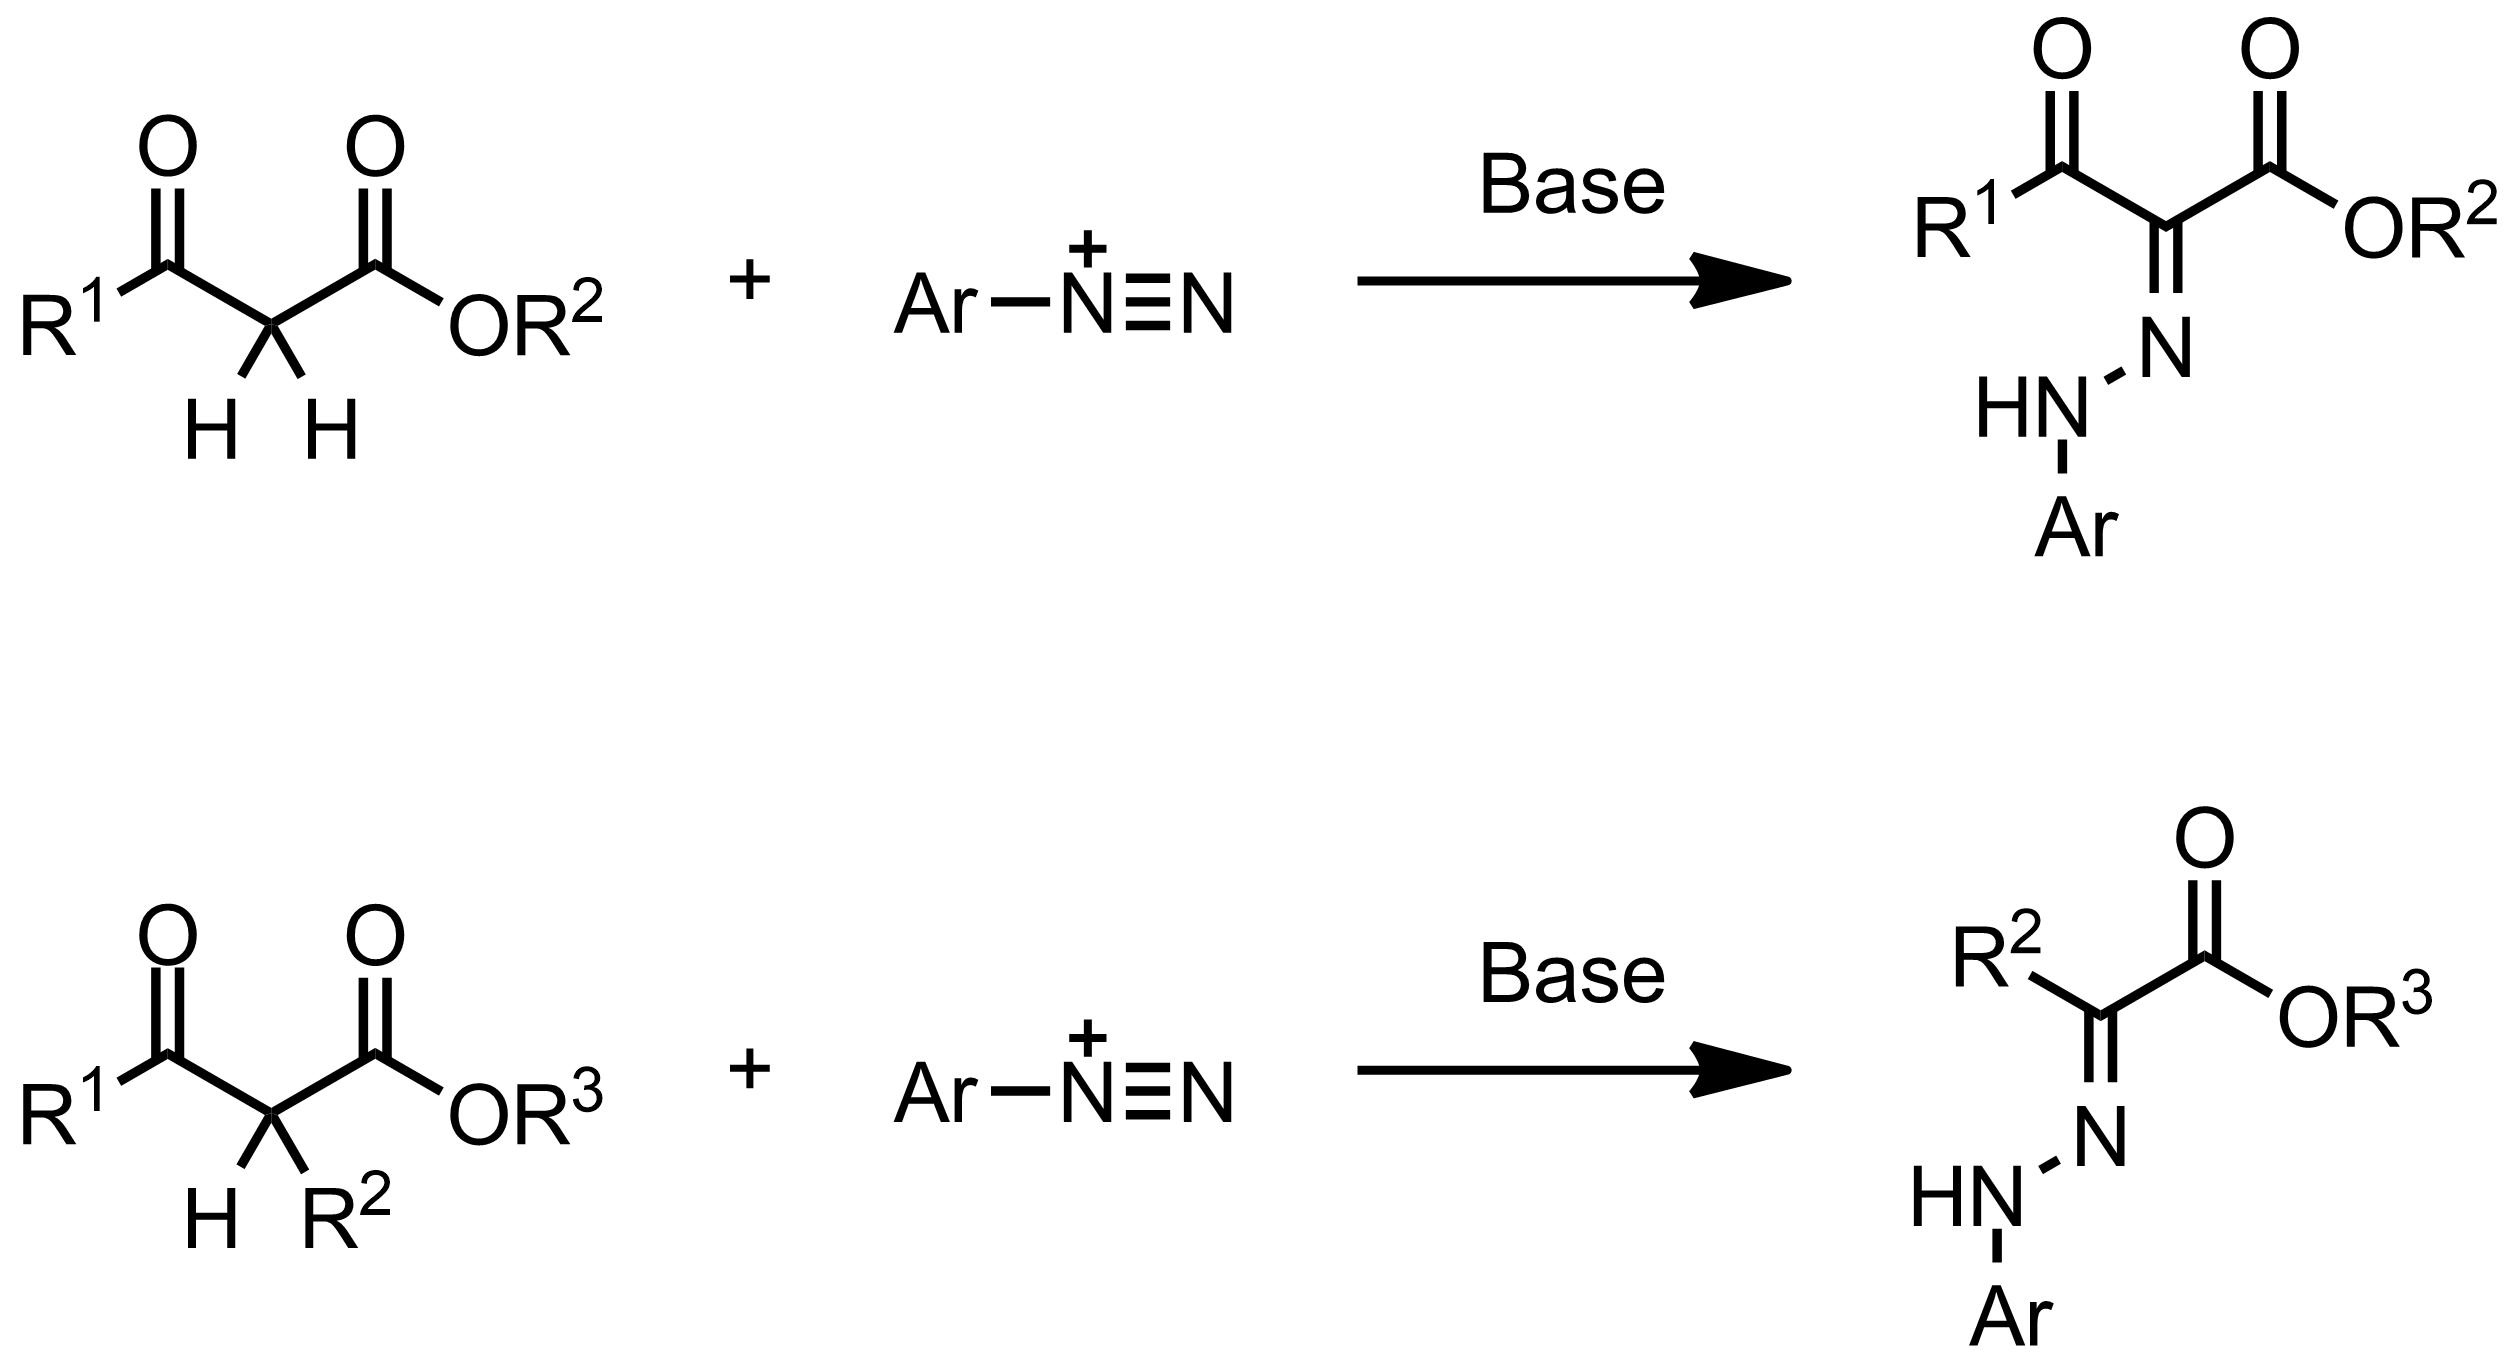 Schematic representation of the Japp-Klingemann Reaction.